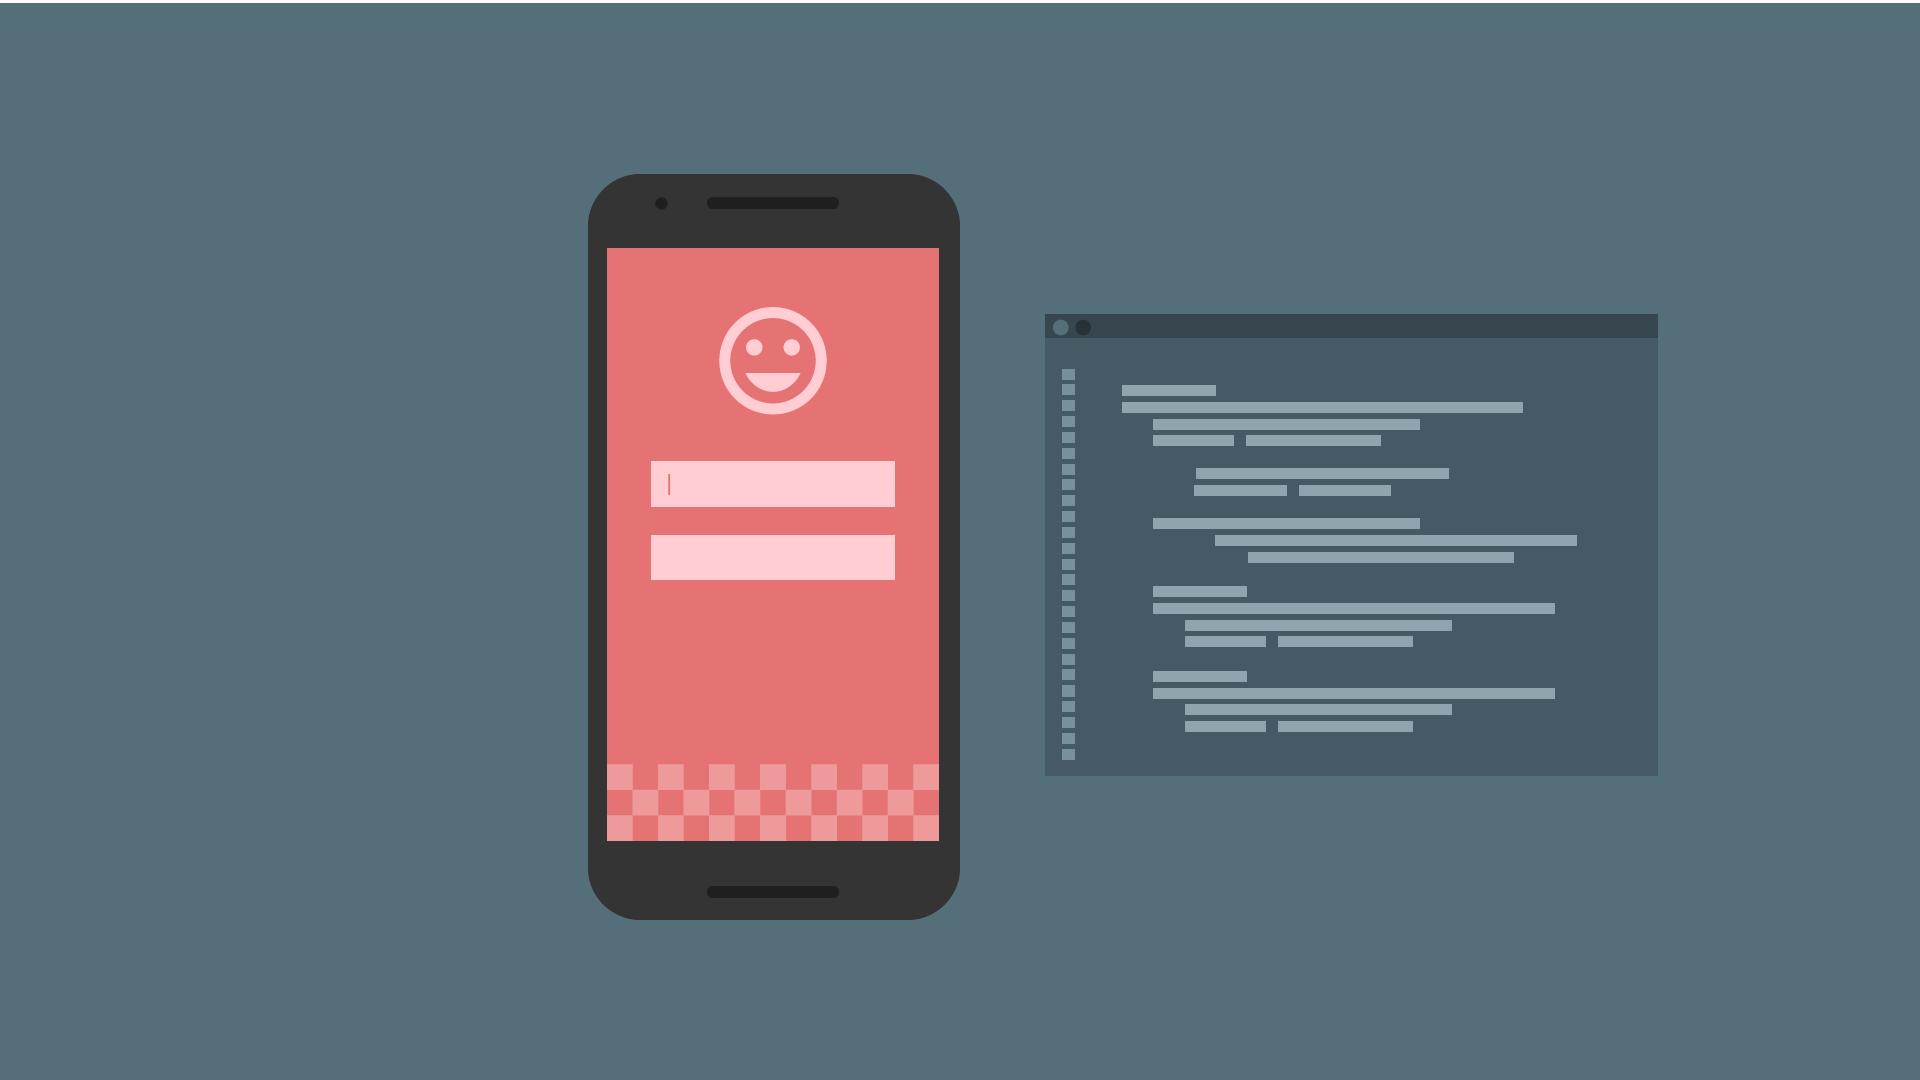 Illustration of mobile device